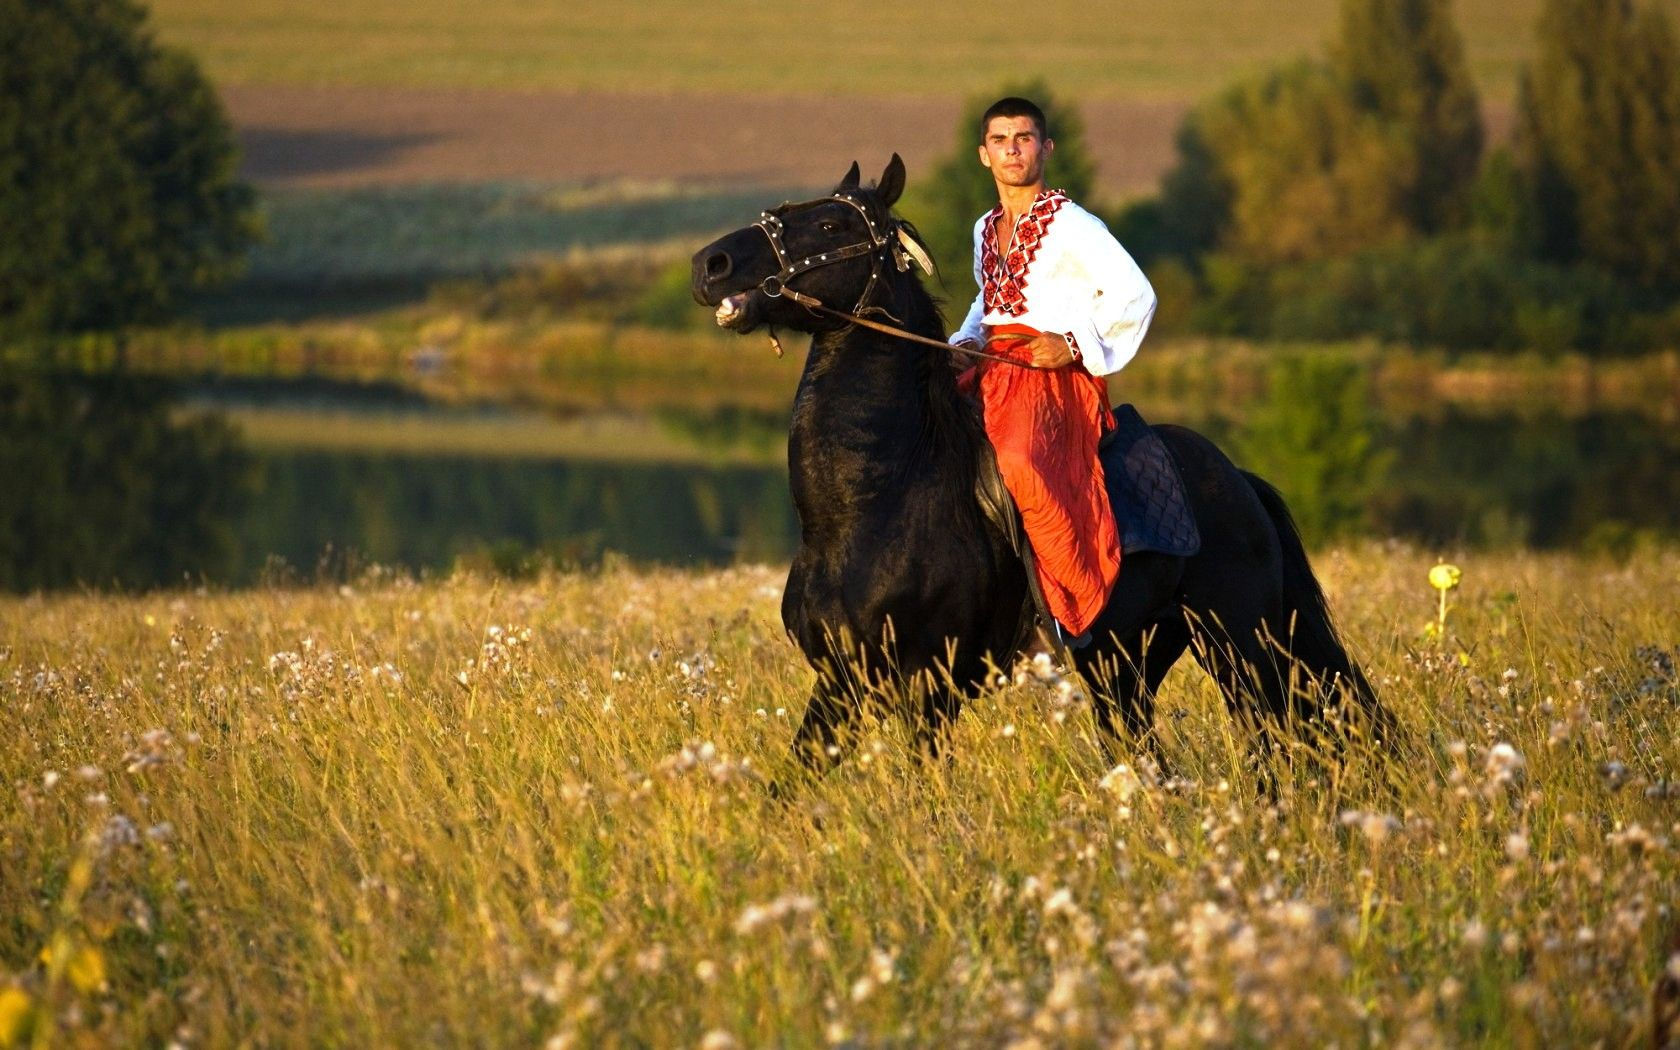 Black Stallion Man Horse Riding Horses Wallpaper Background 2107066 Hd Wallpaper Backgrounds Download